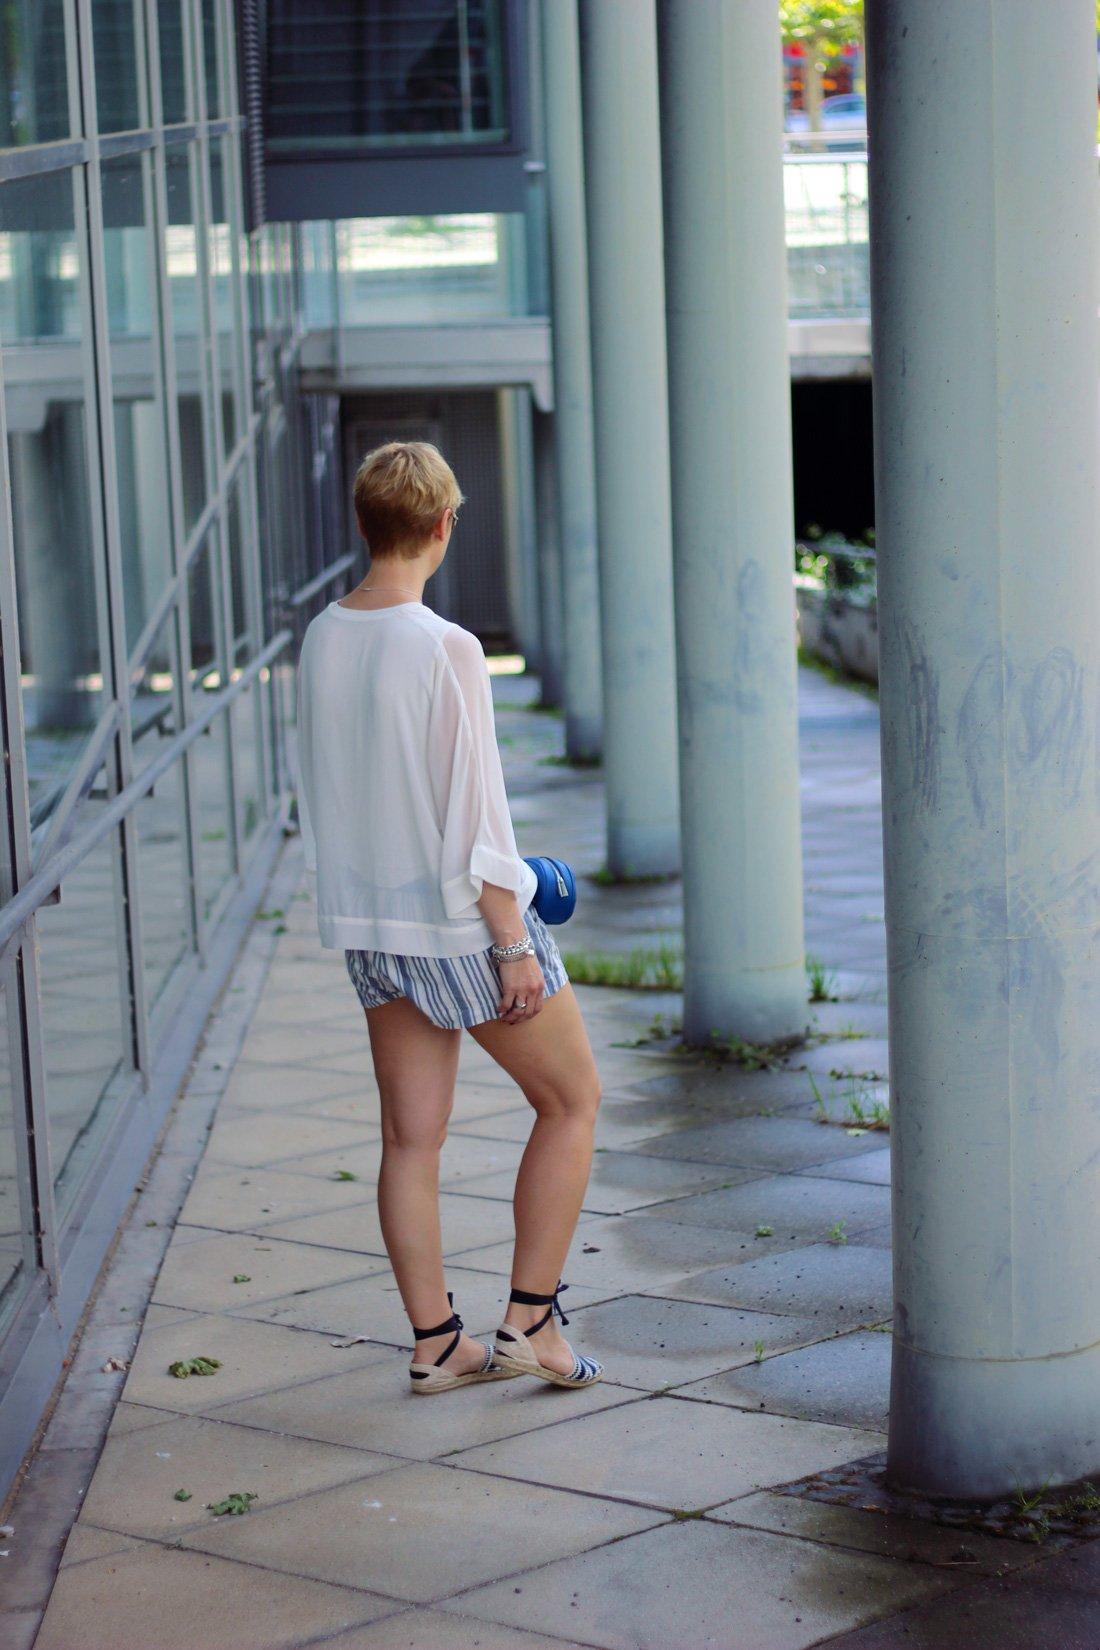 Conny-Doll-Lifestyle: Shorts, Sommerlook, Castaner, Transparenz, Espandrillos, Bluse-weiß